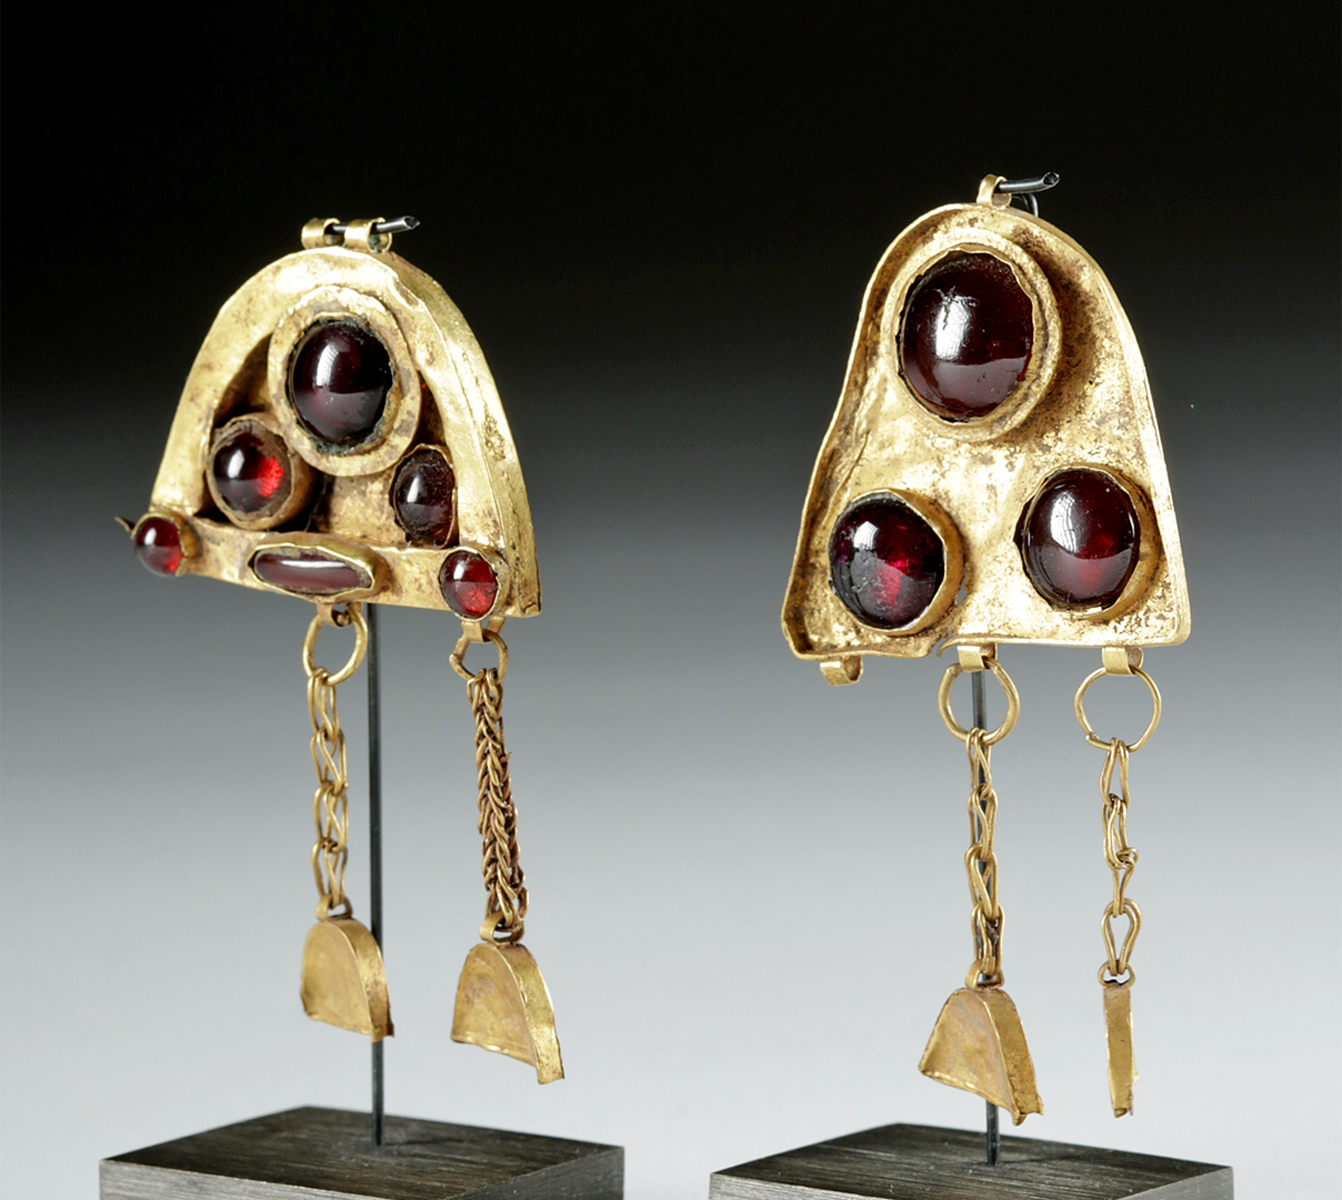 Lot 26b - Amazing Hellenistic Gold & Garnet Earrings - 9.4 g